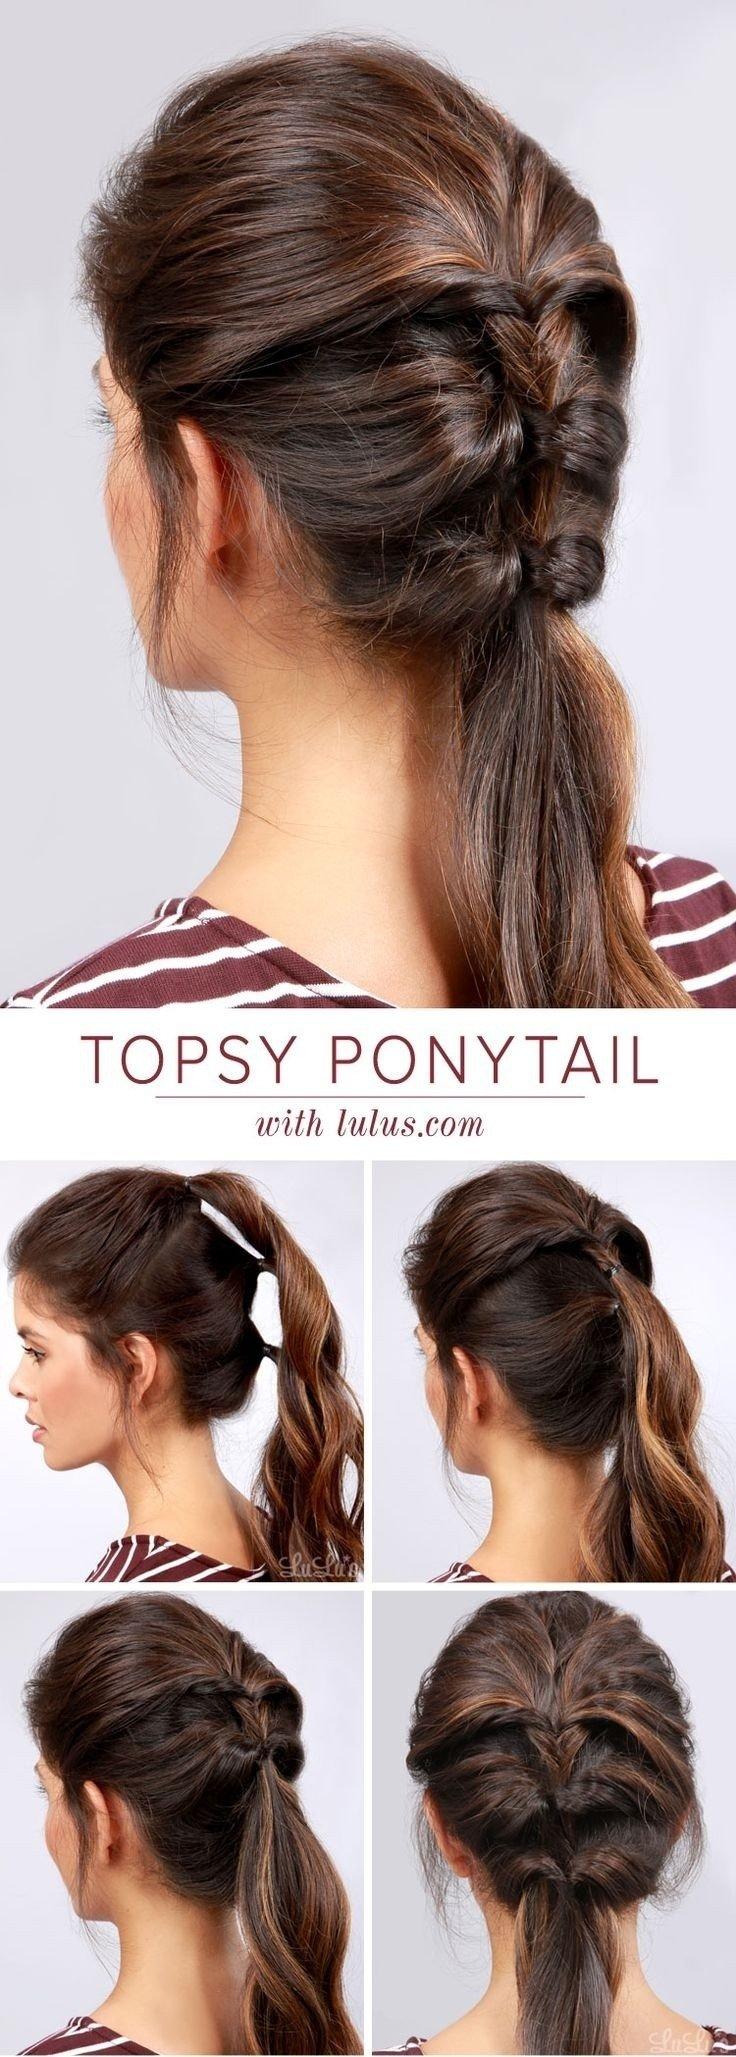 10 Fantastic Cute Ponytail Ideas For Medium Hair 20 ponytail hairstyles discover latest ponytail ideas now 2 2020